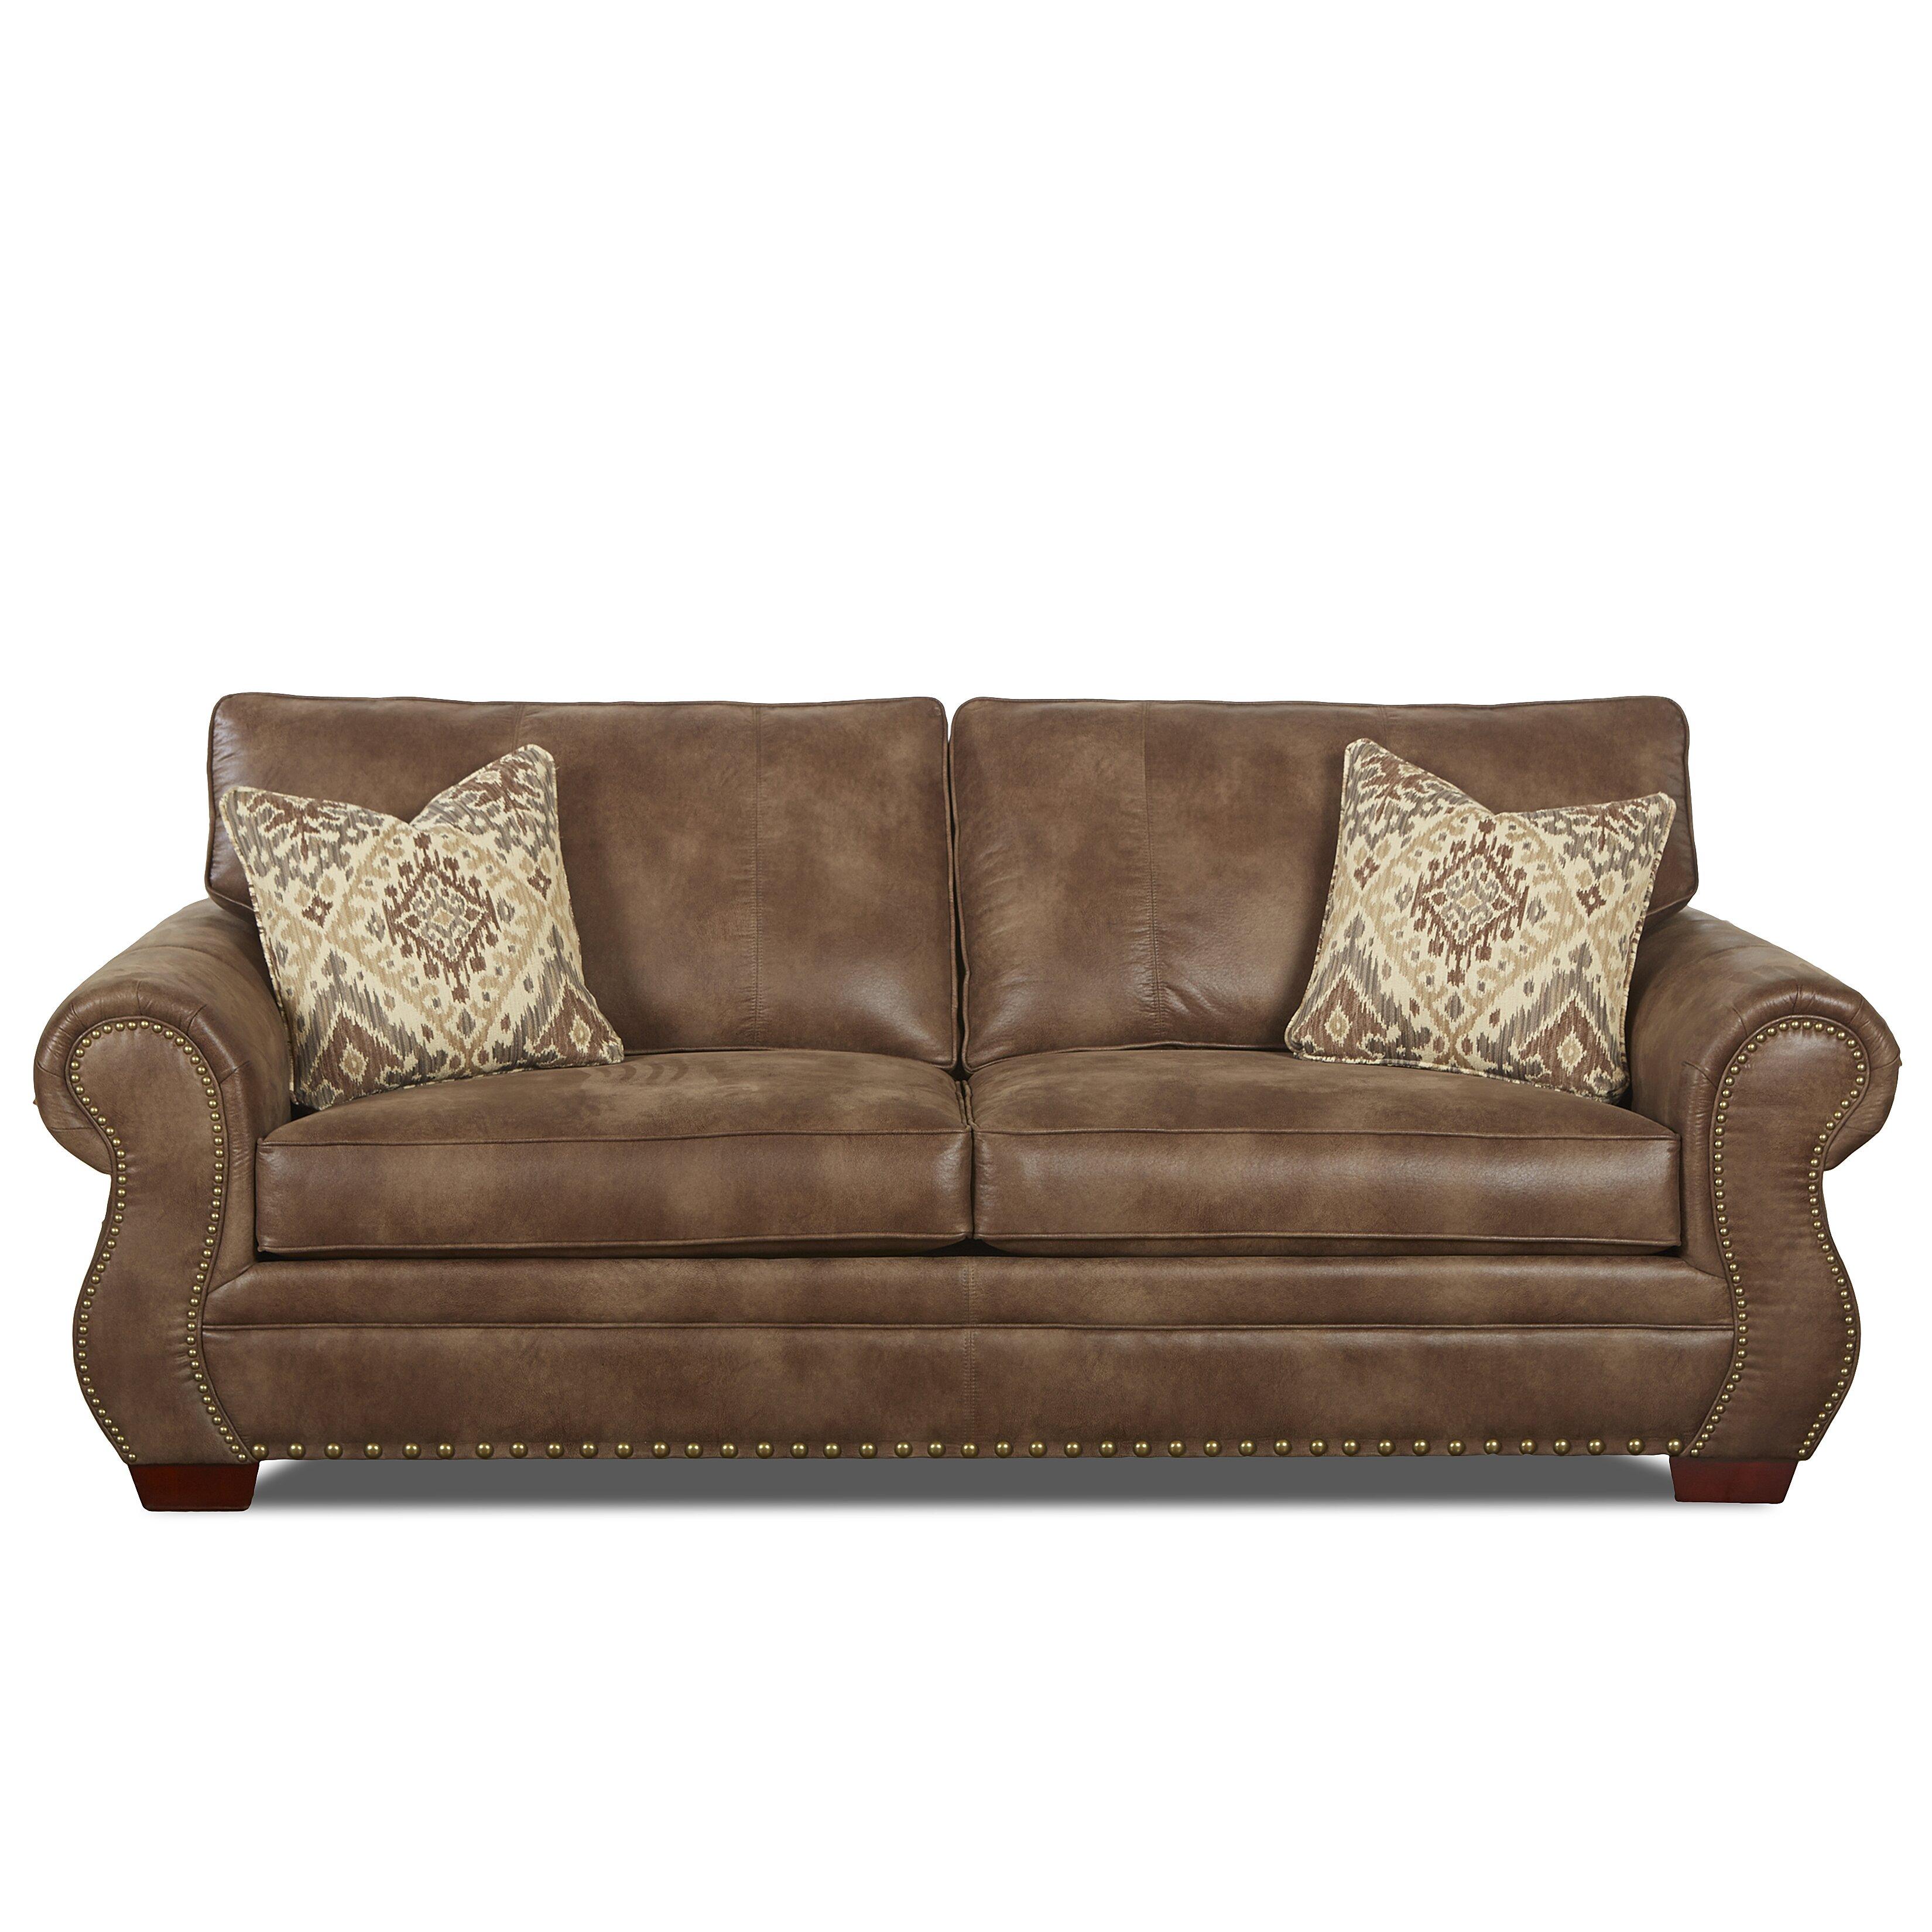 Klaussner Leather Sofa Review: Klaussner Furniture Jackie Sofa & Reviews